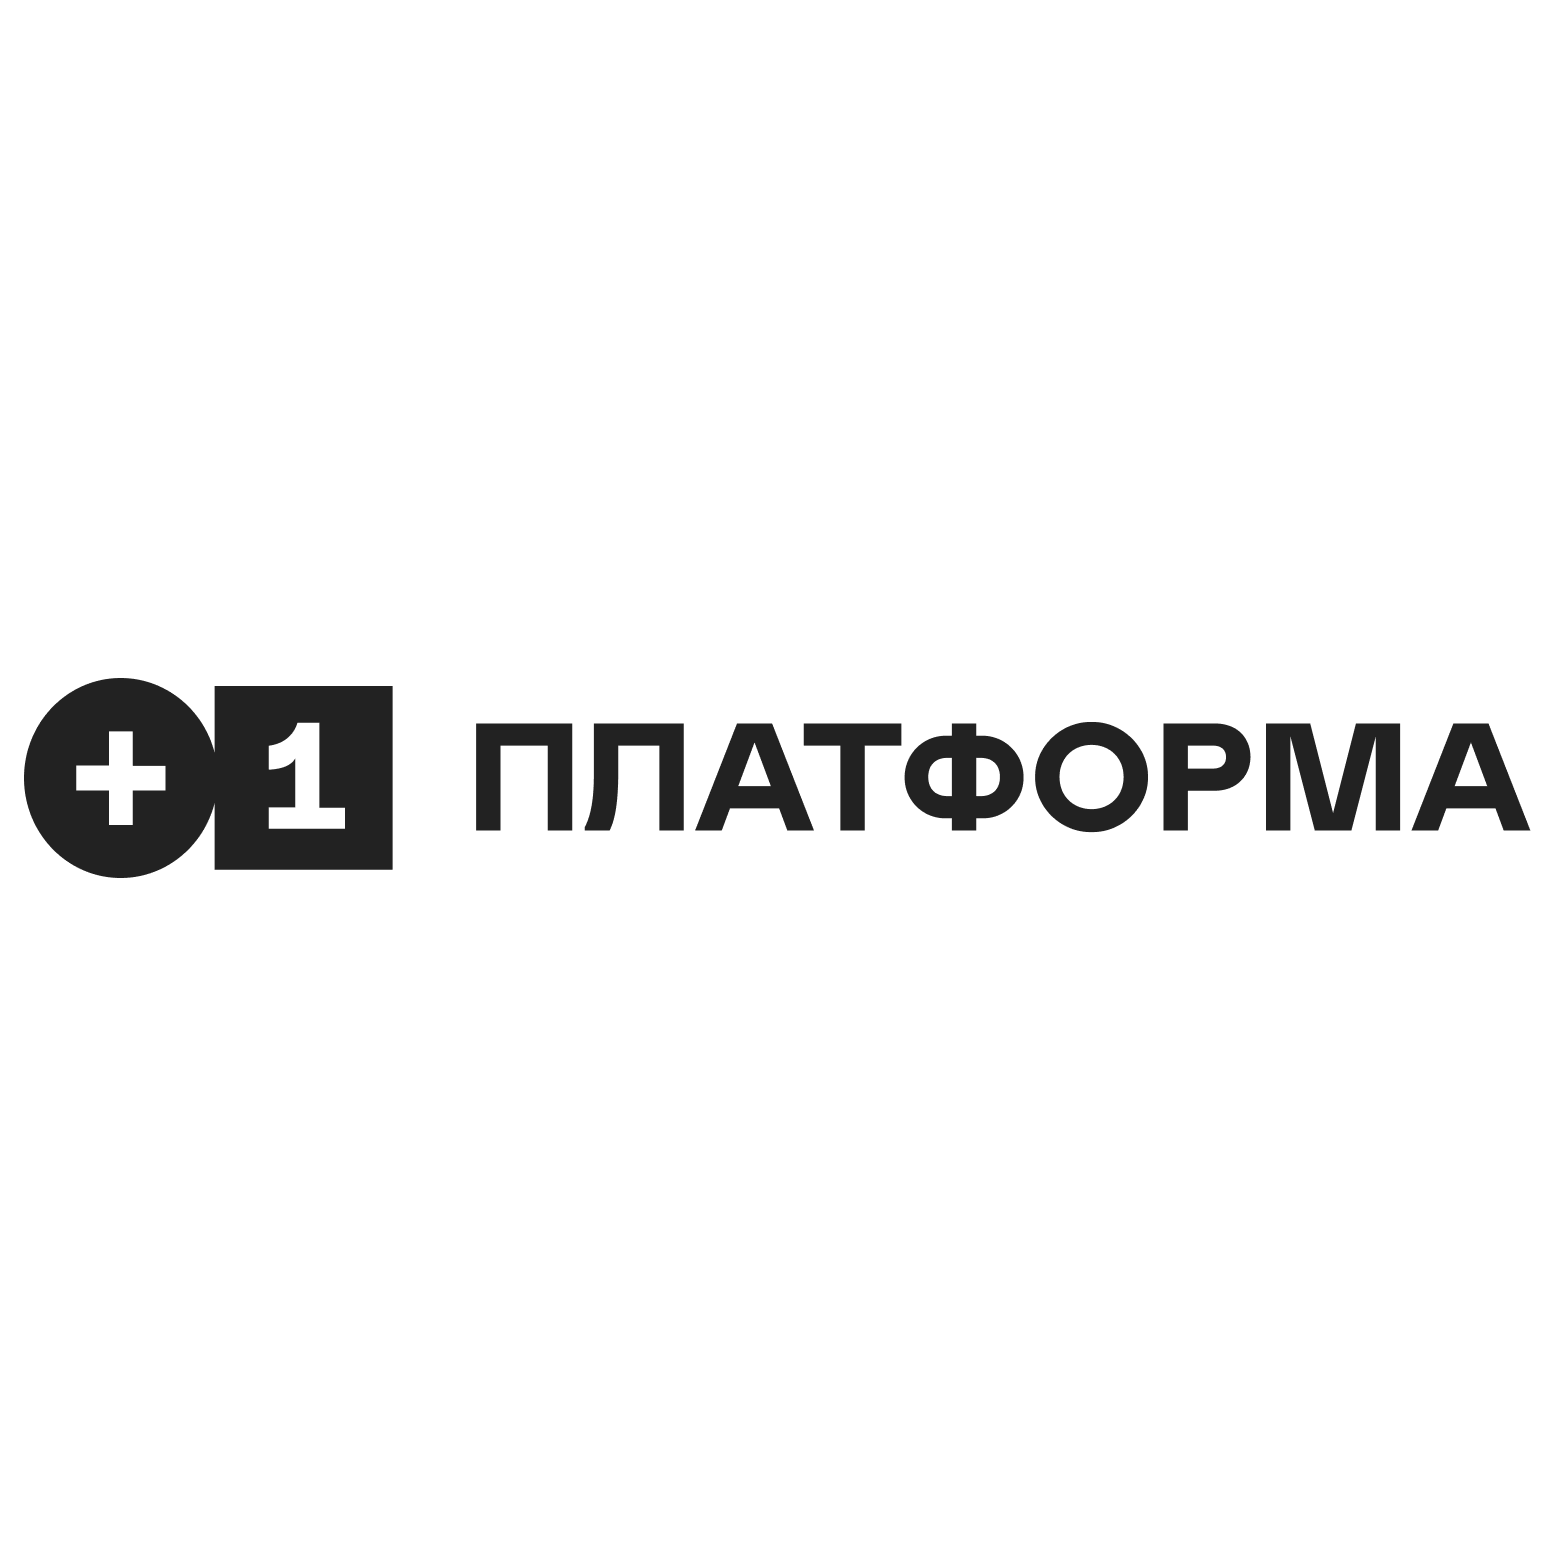 Logo +1